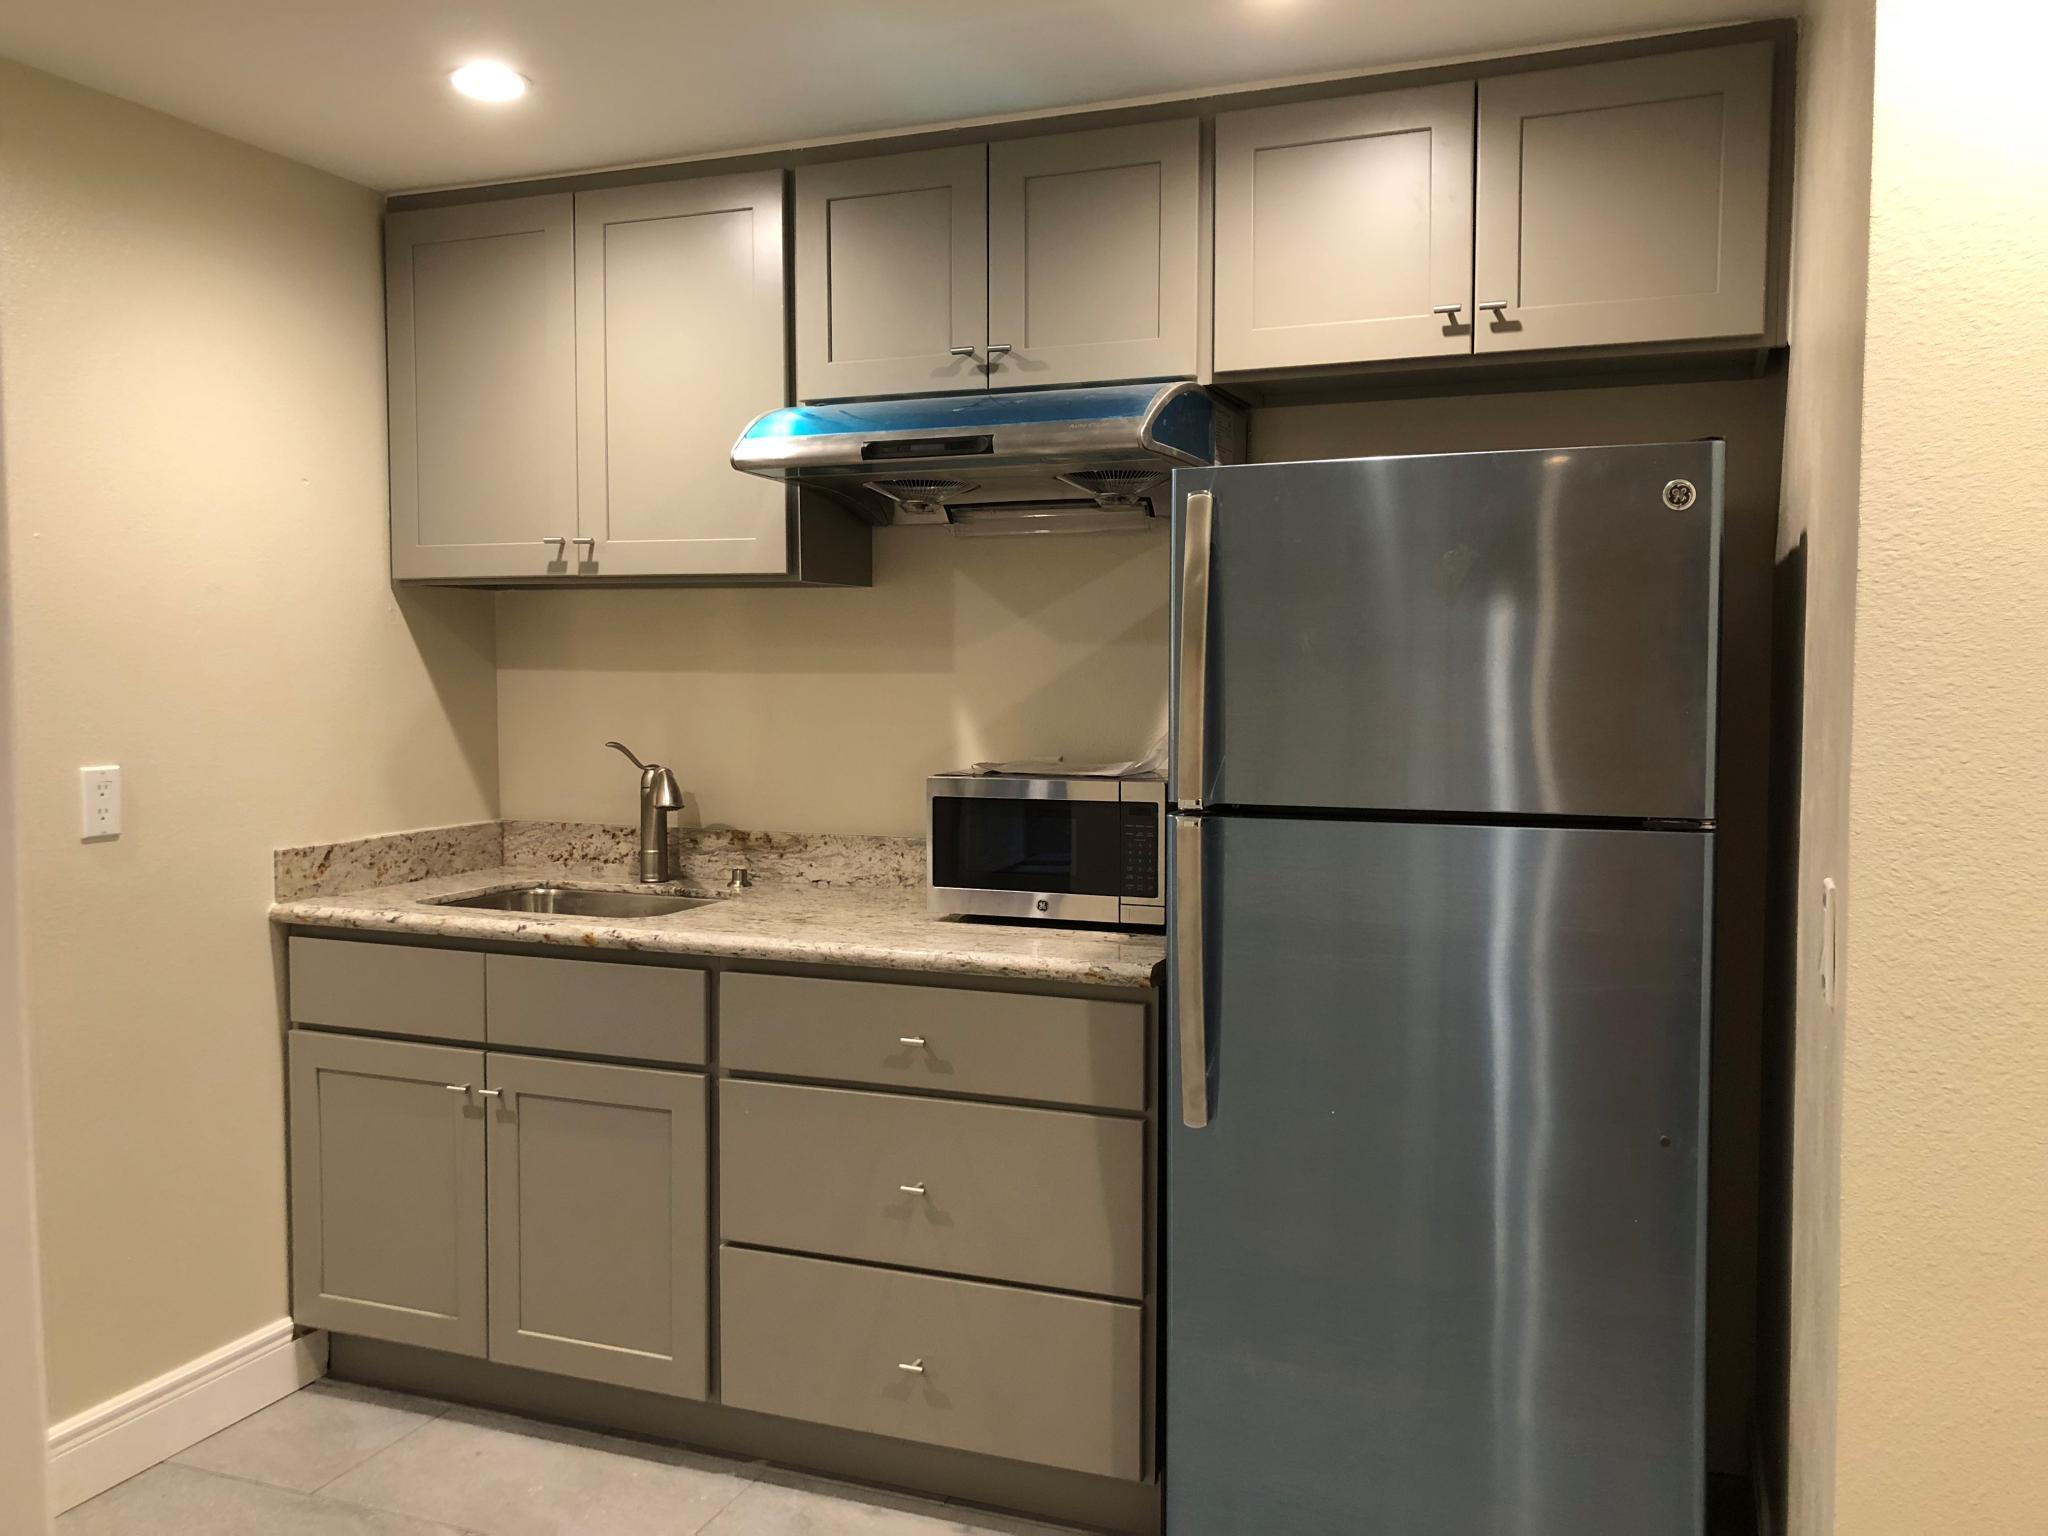 1522 19th Ave, San Francisco, CA 94122 For Rent | Trulia